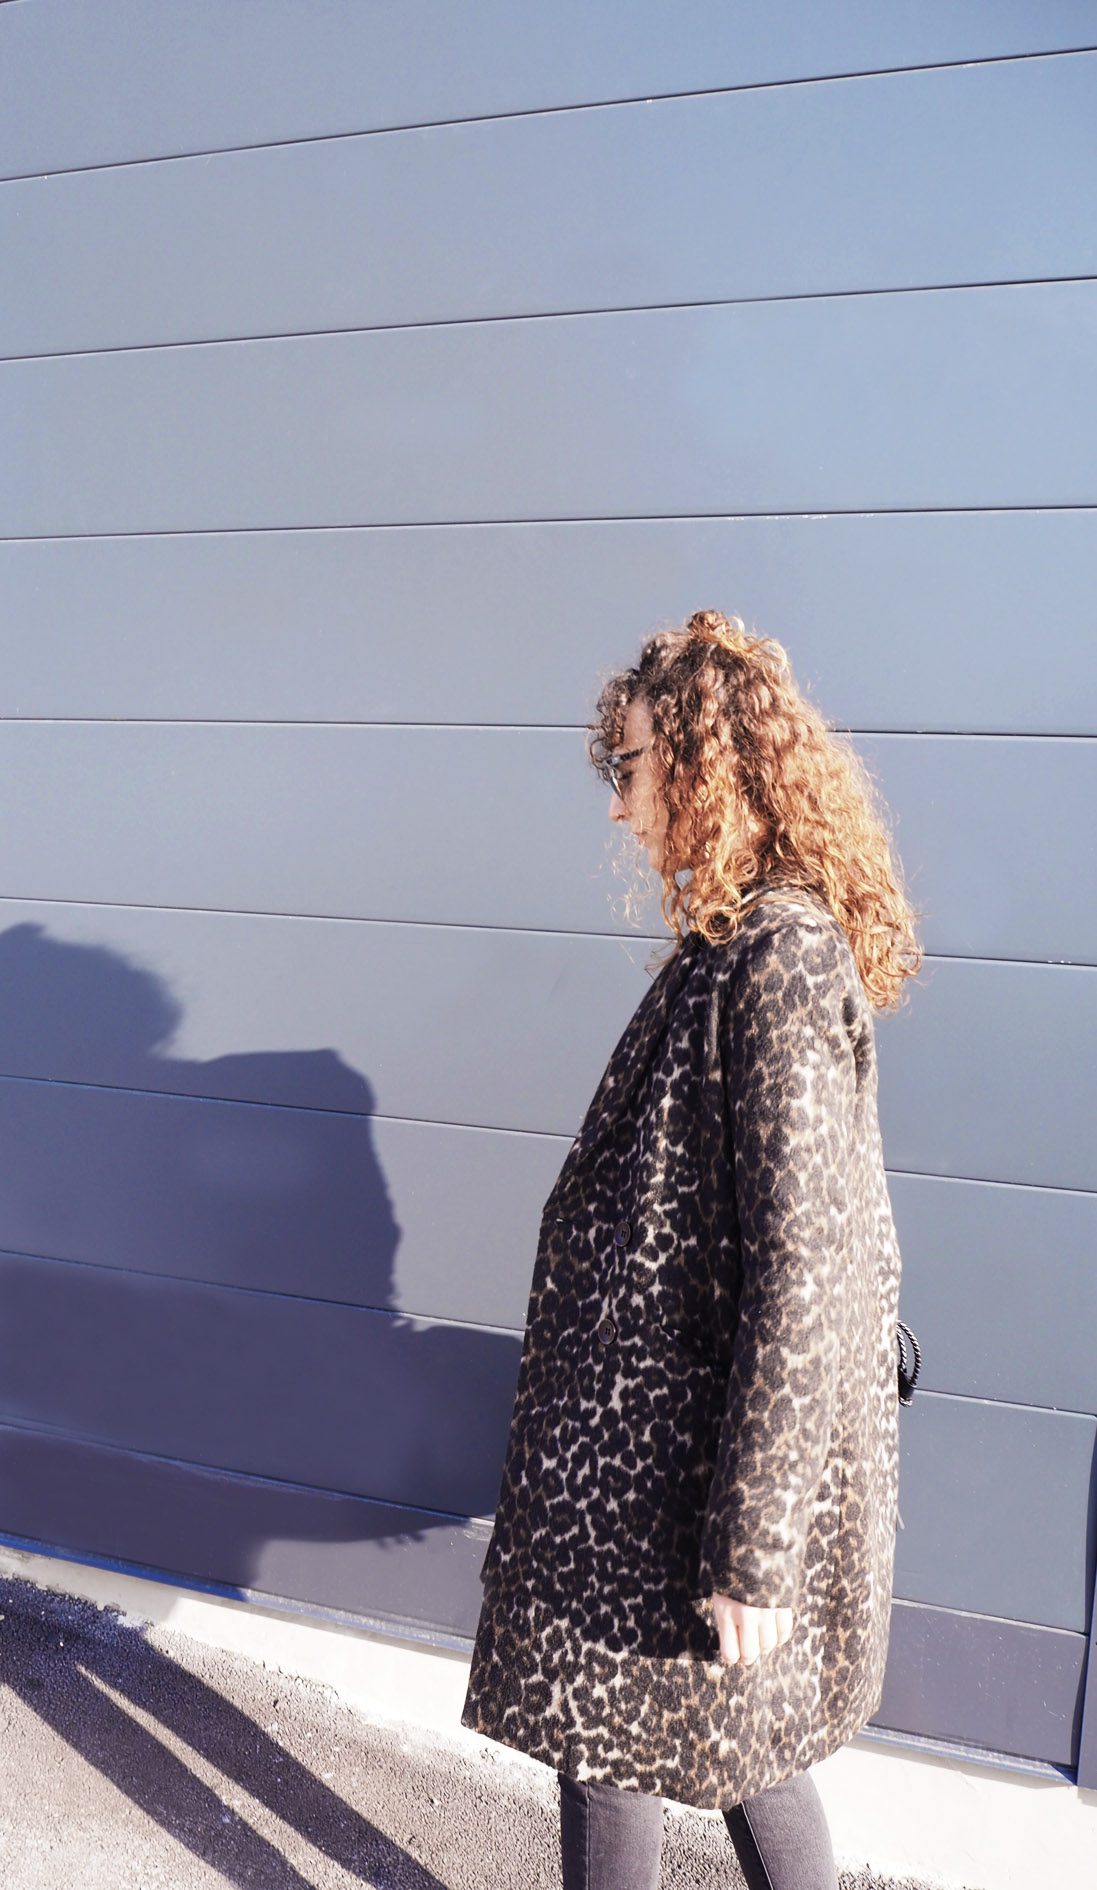 manteau leopard look femme tendances trends hiver 2018 mohanita creations fashion fashionista mode look lifestyle designer